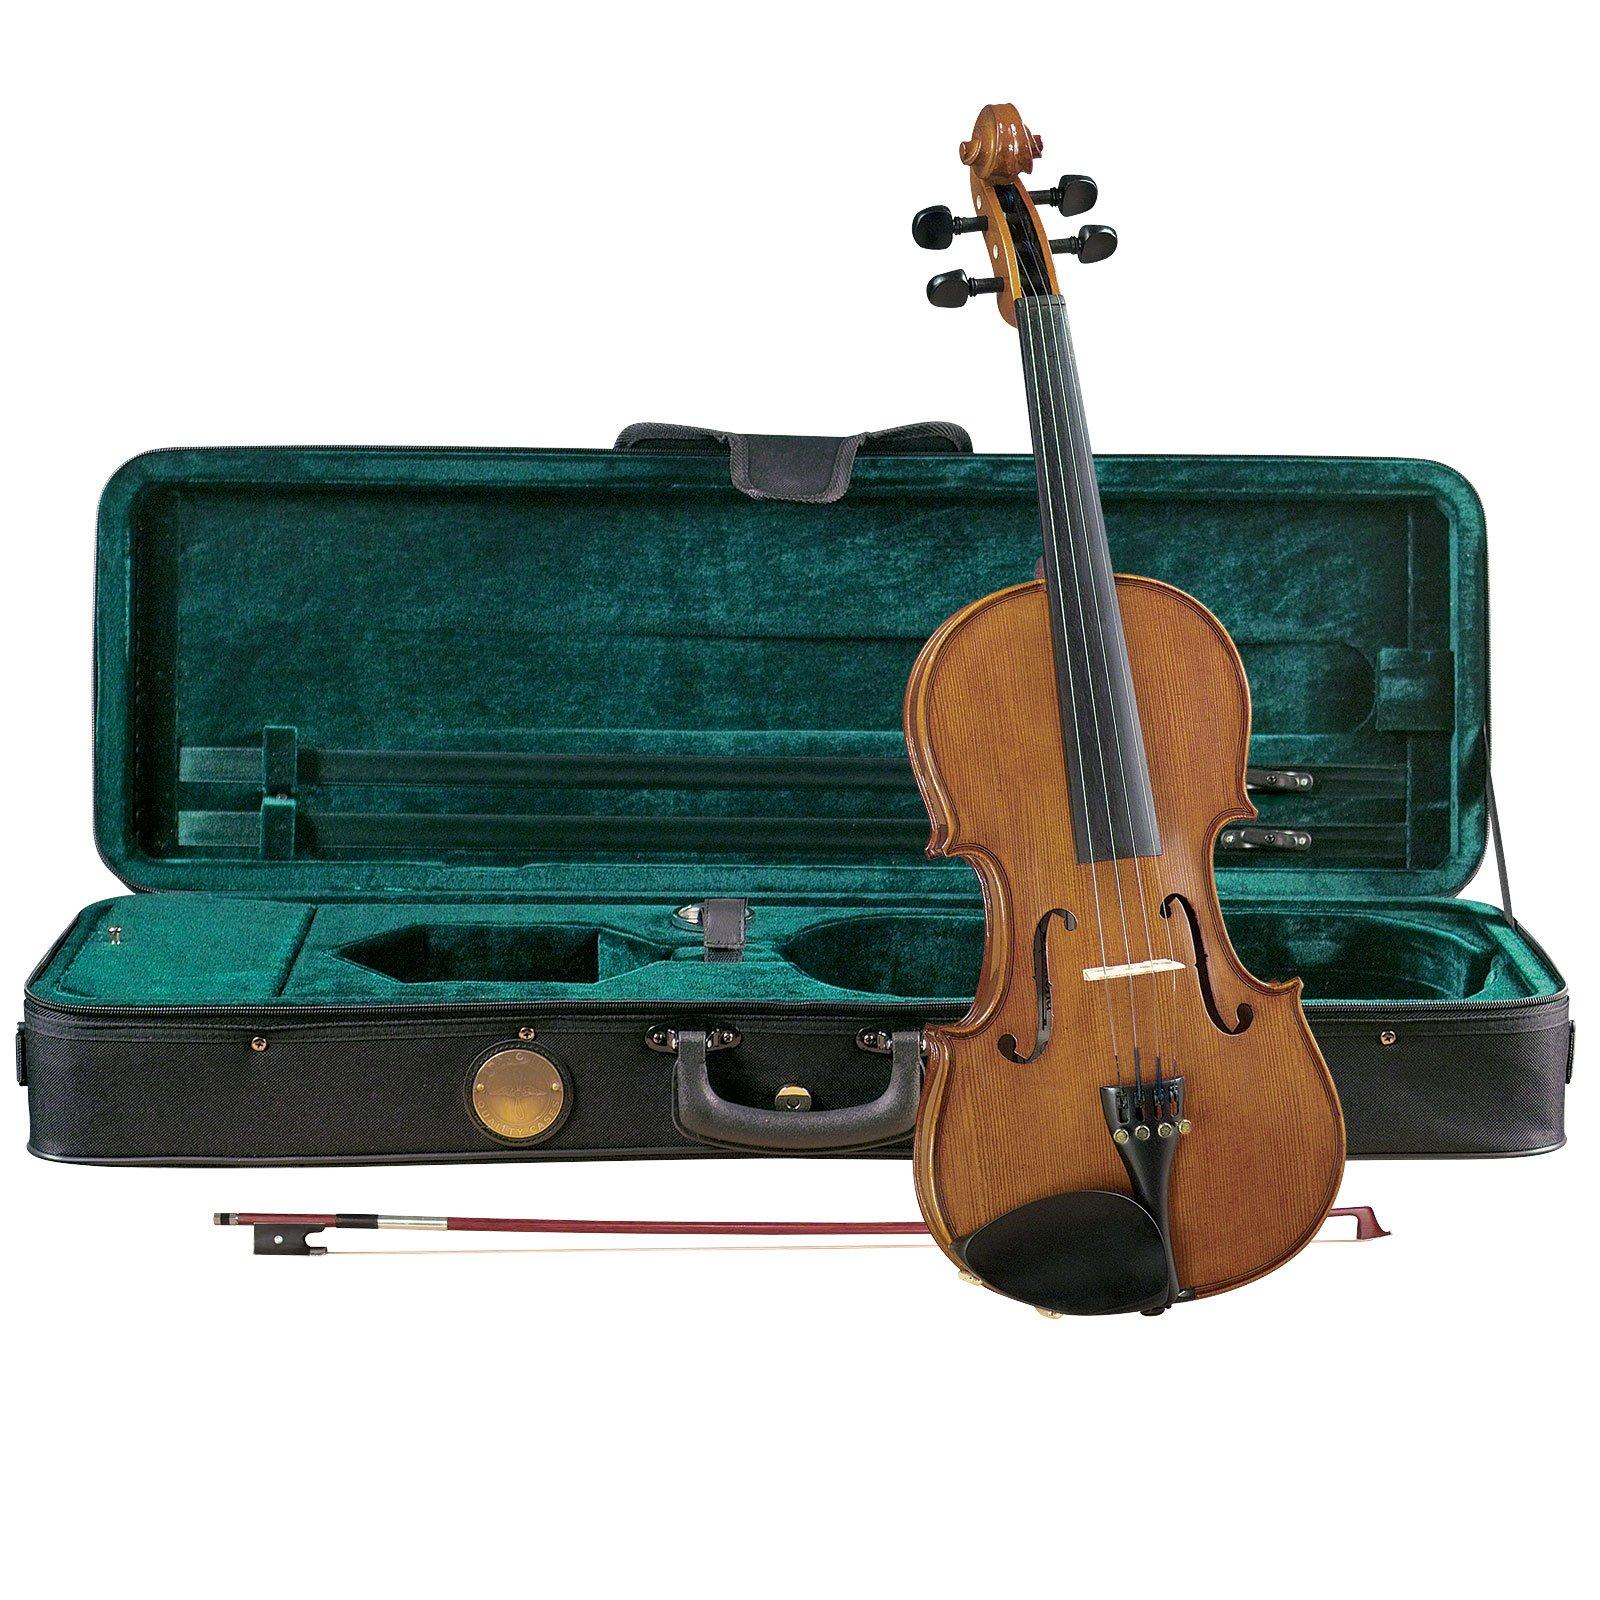 Cremona SV-175 Premier Student Violin Outfit - 1/16 Size